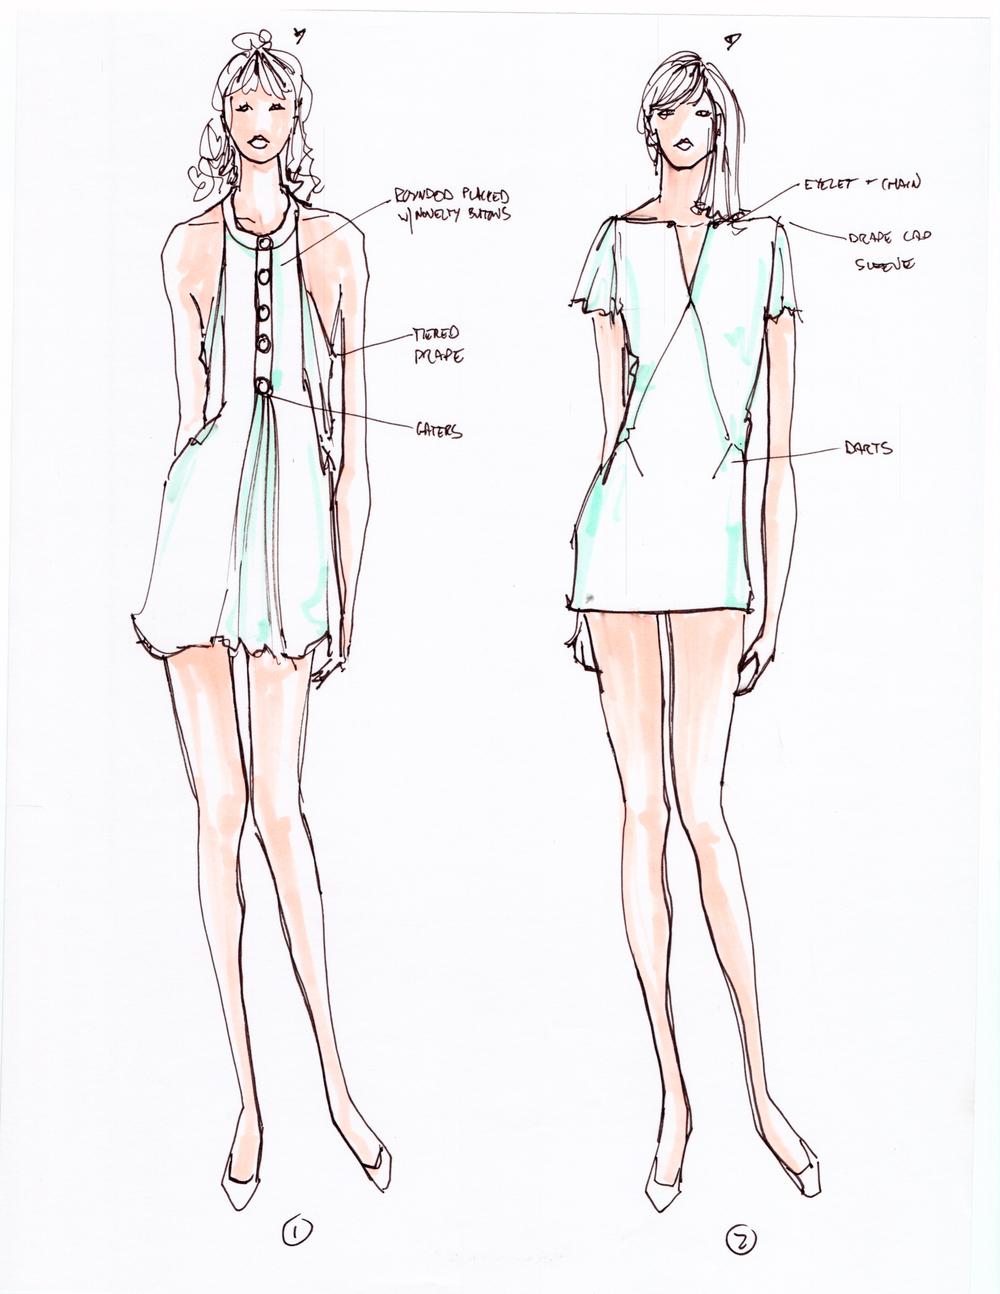 Dresses 1 Sketches.jpg